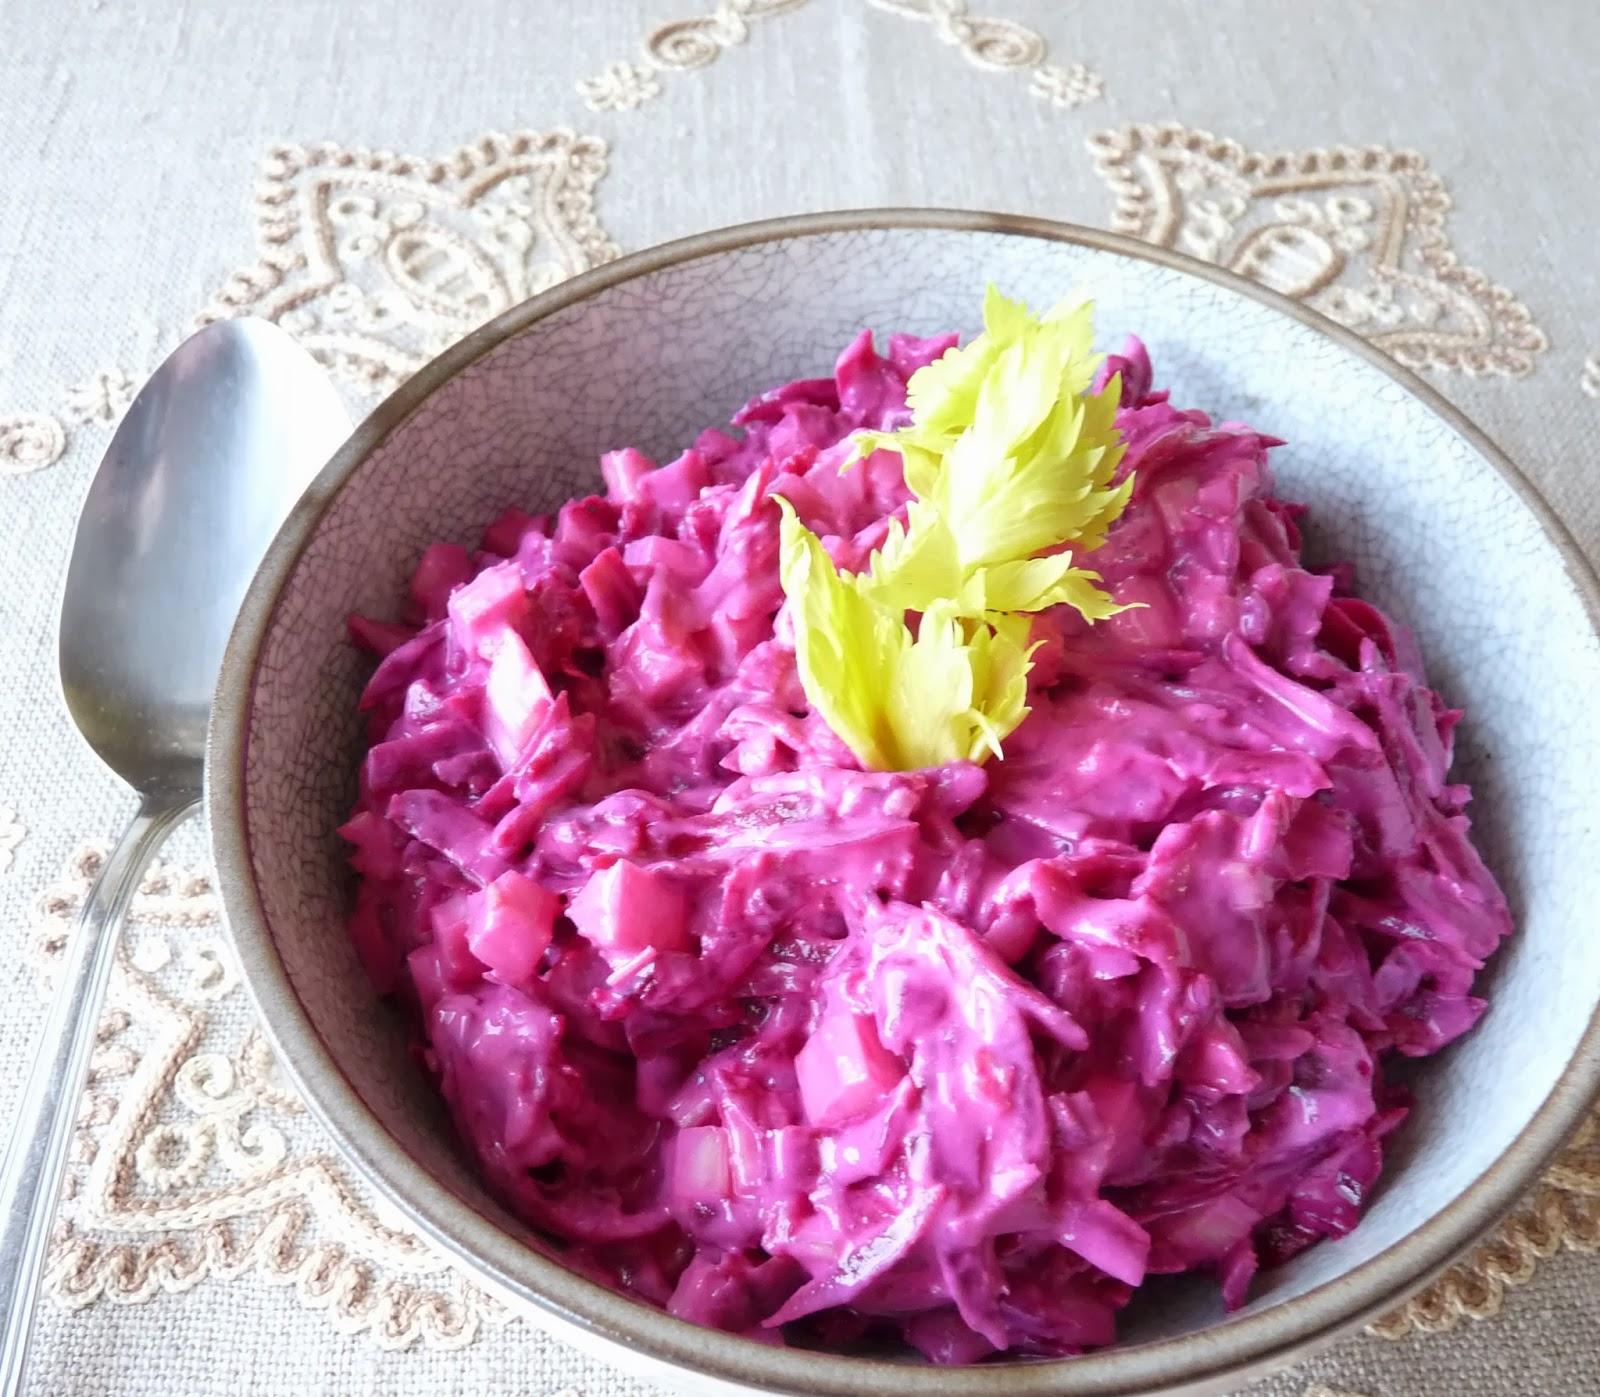 Beets with Yogurt & Garlic